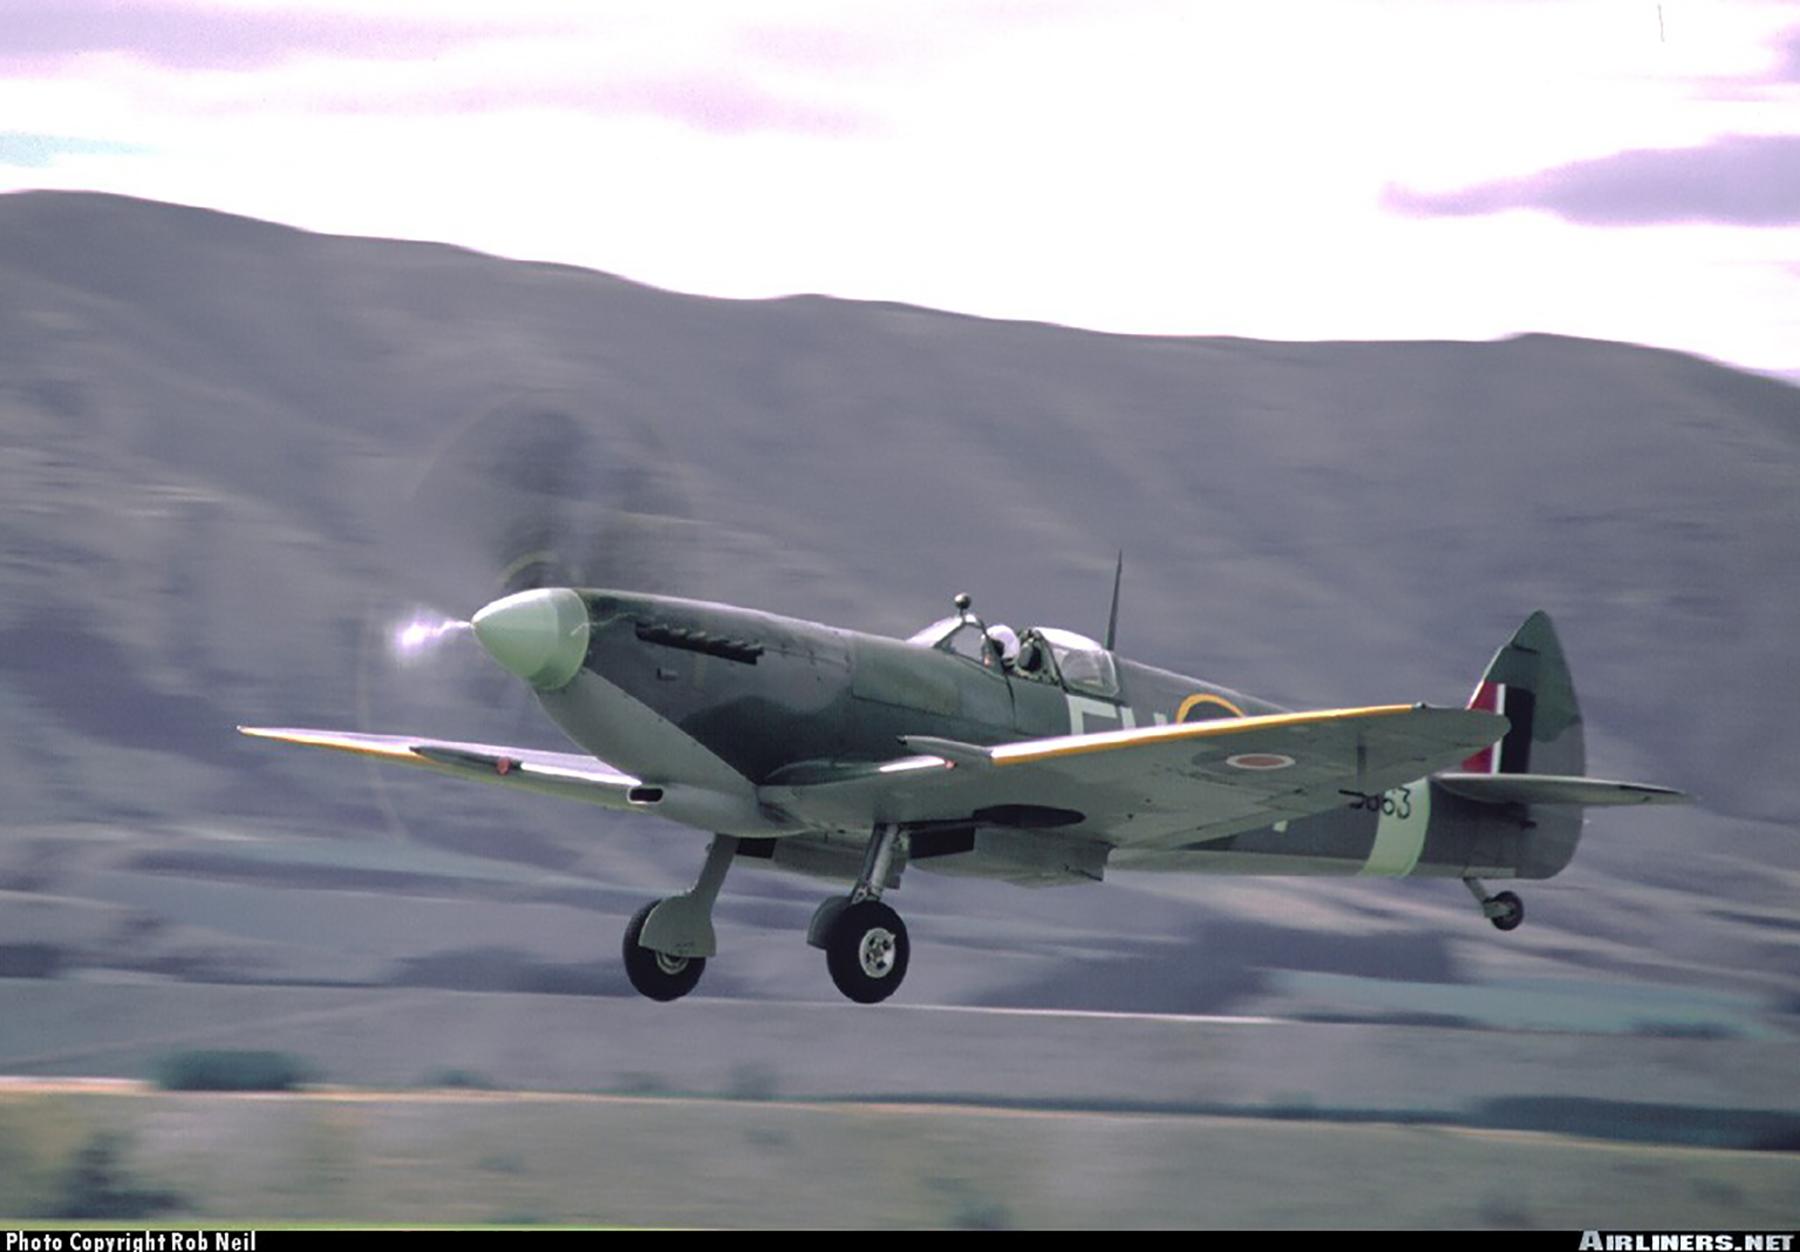 Airworthy Spitfire warbird LFXVI RAAF 453Sqn FUP TB863 05